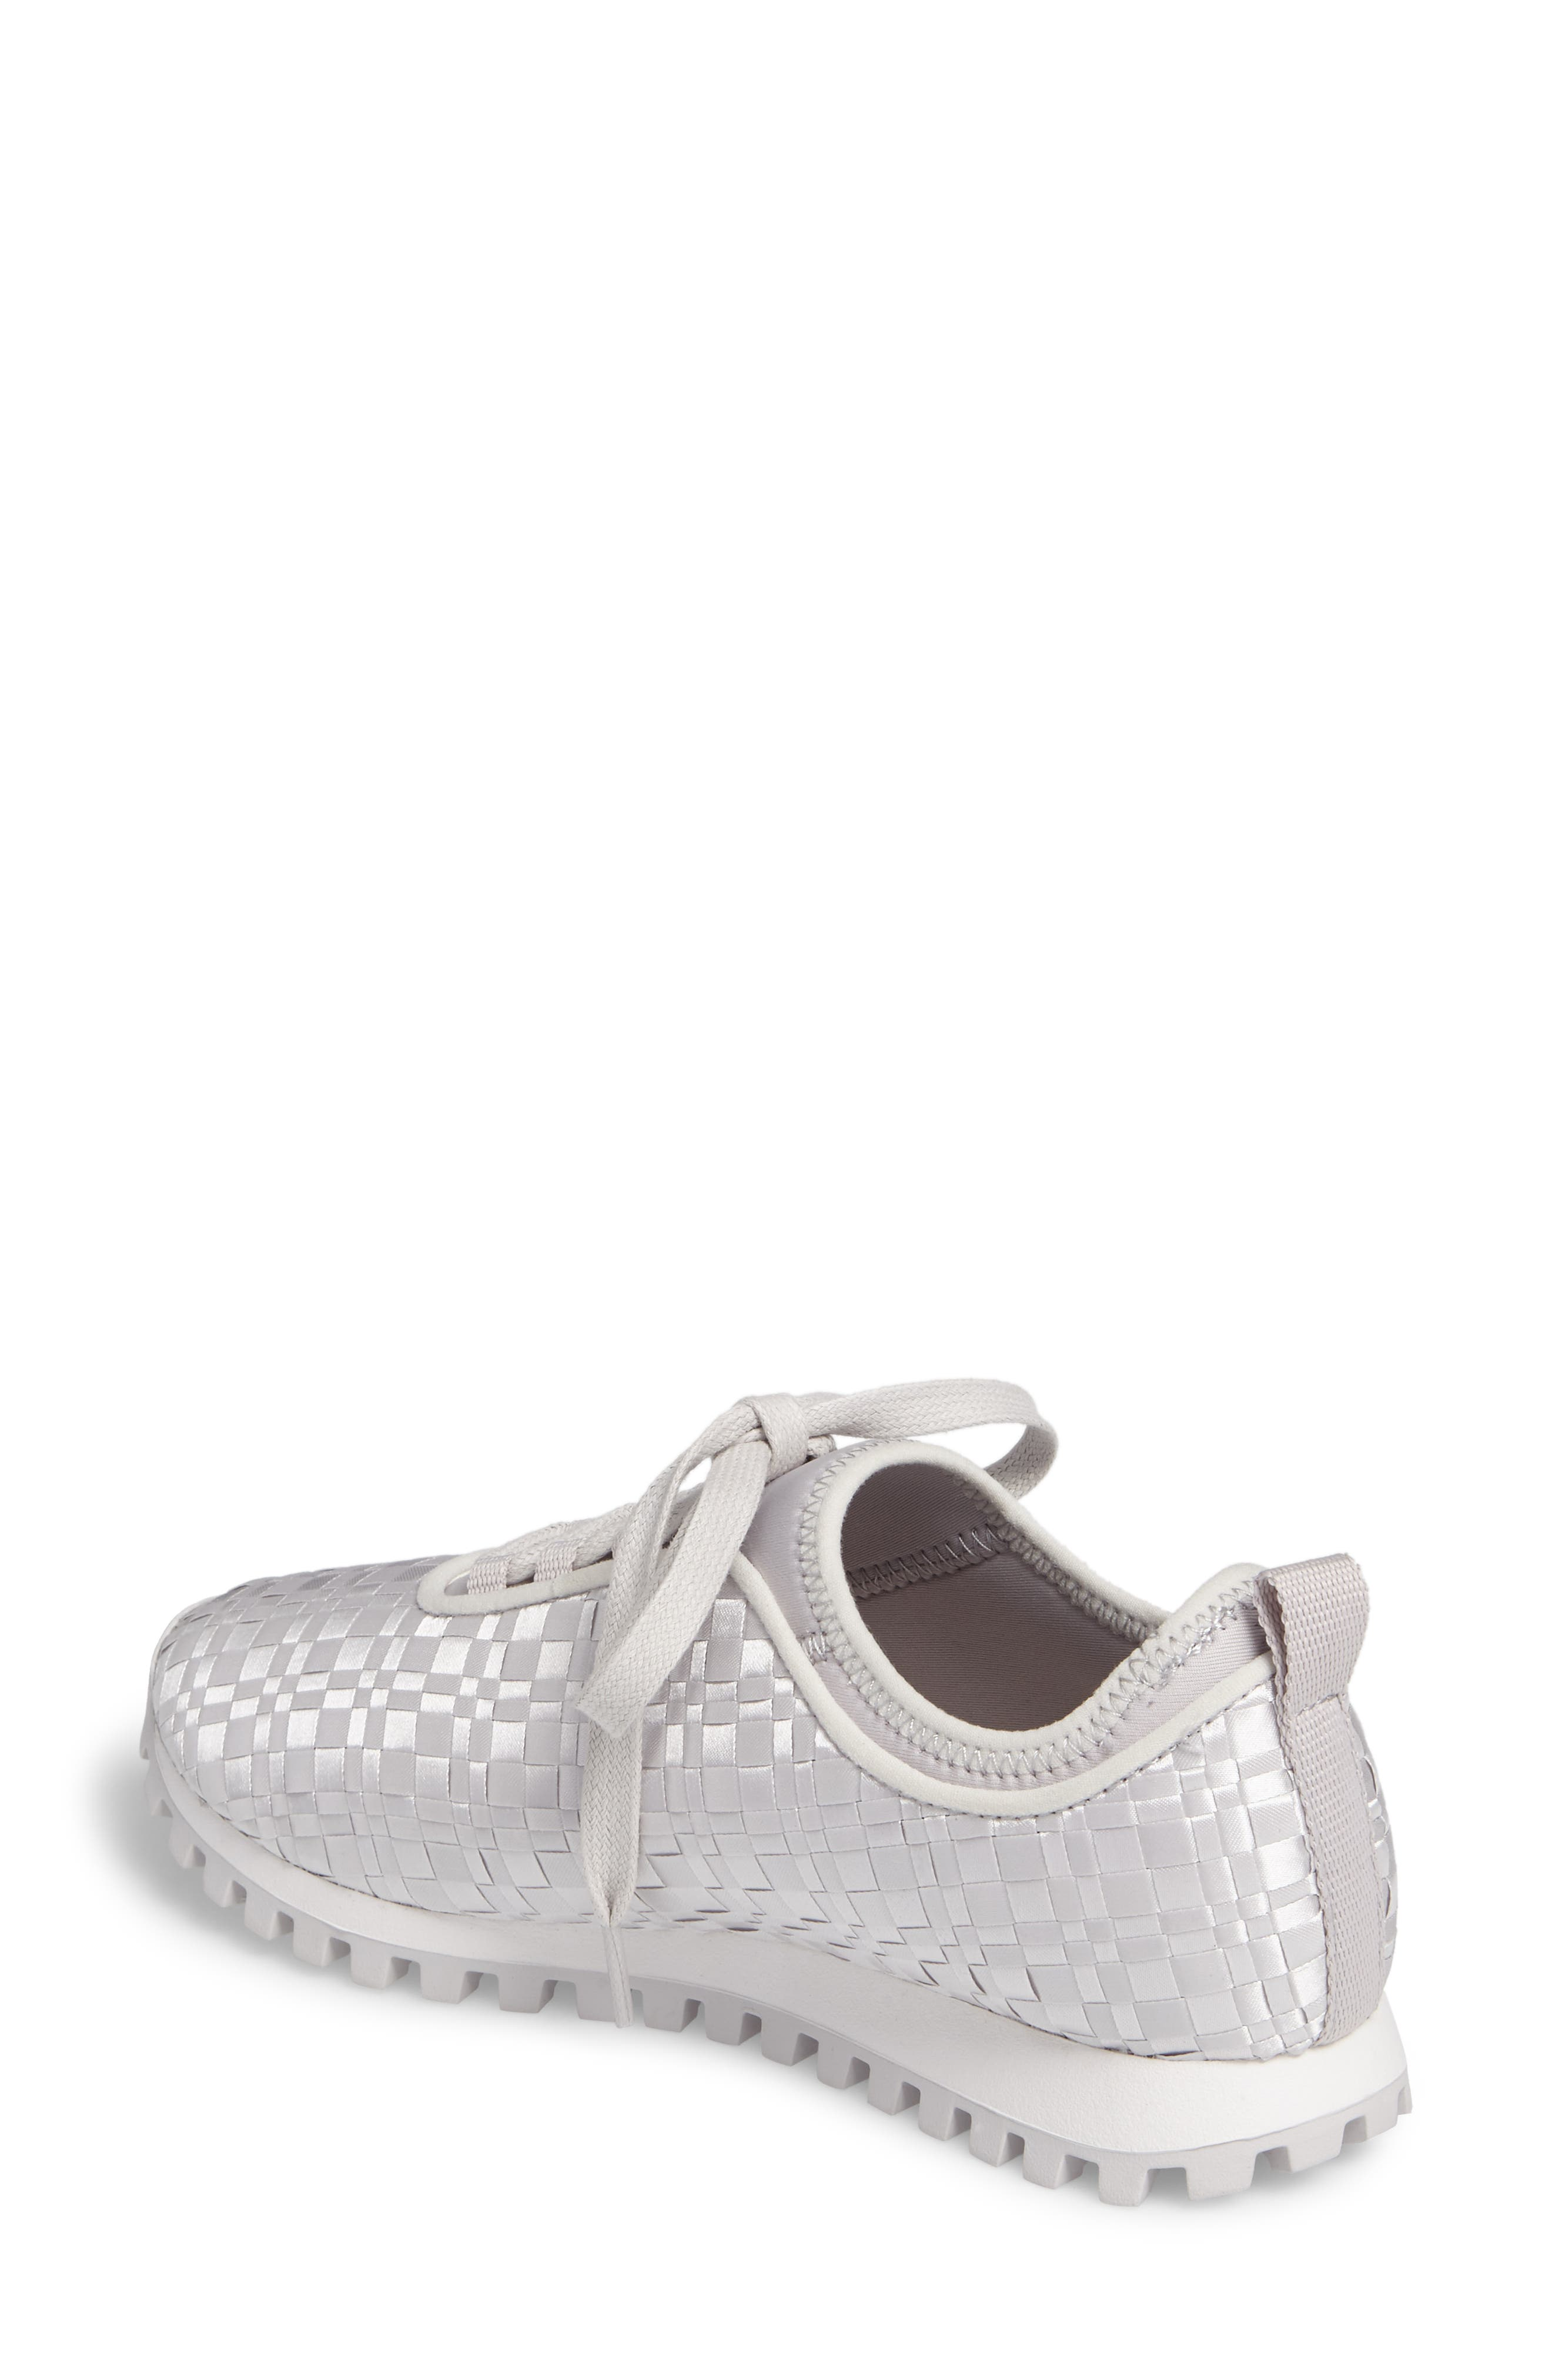 Lynn Sock Fit Woven Sneaker,                             Alternate thumbnail 2, color,                             074